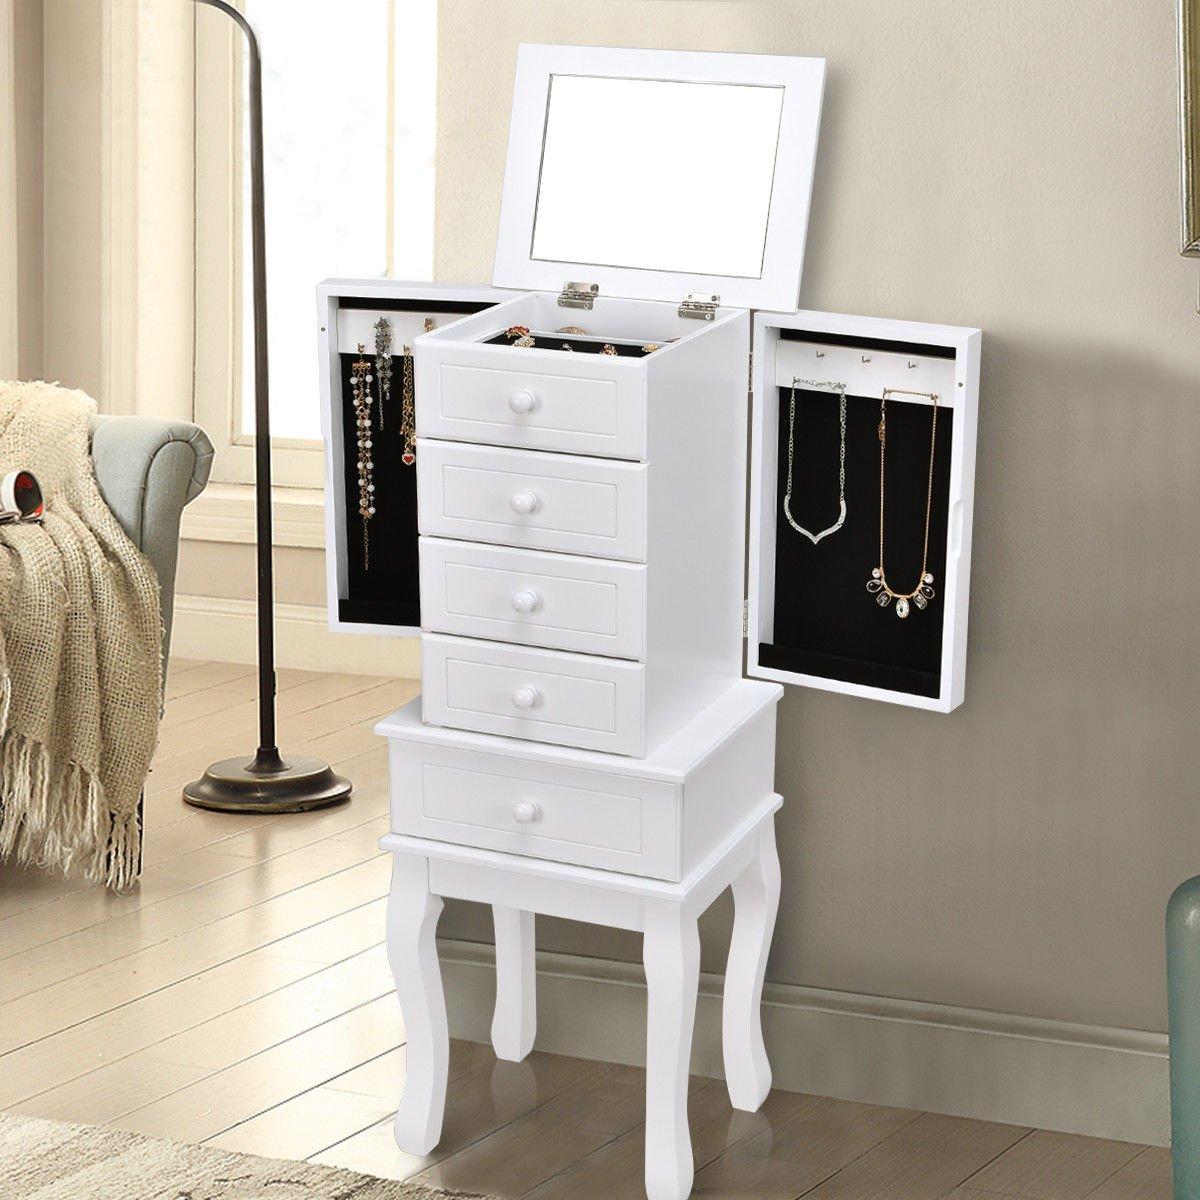 Giantex Standing Jewelry Armoire Flip-top Mirror Wood Box Storage Chest Cabinet Organizer Chest